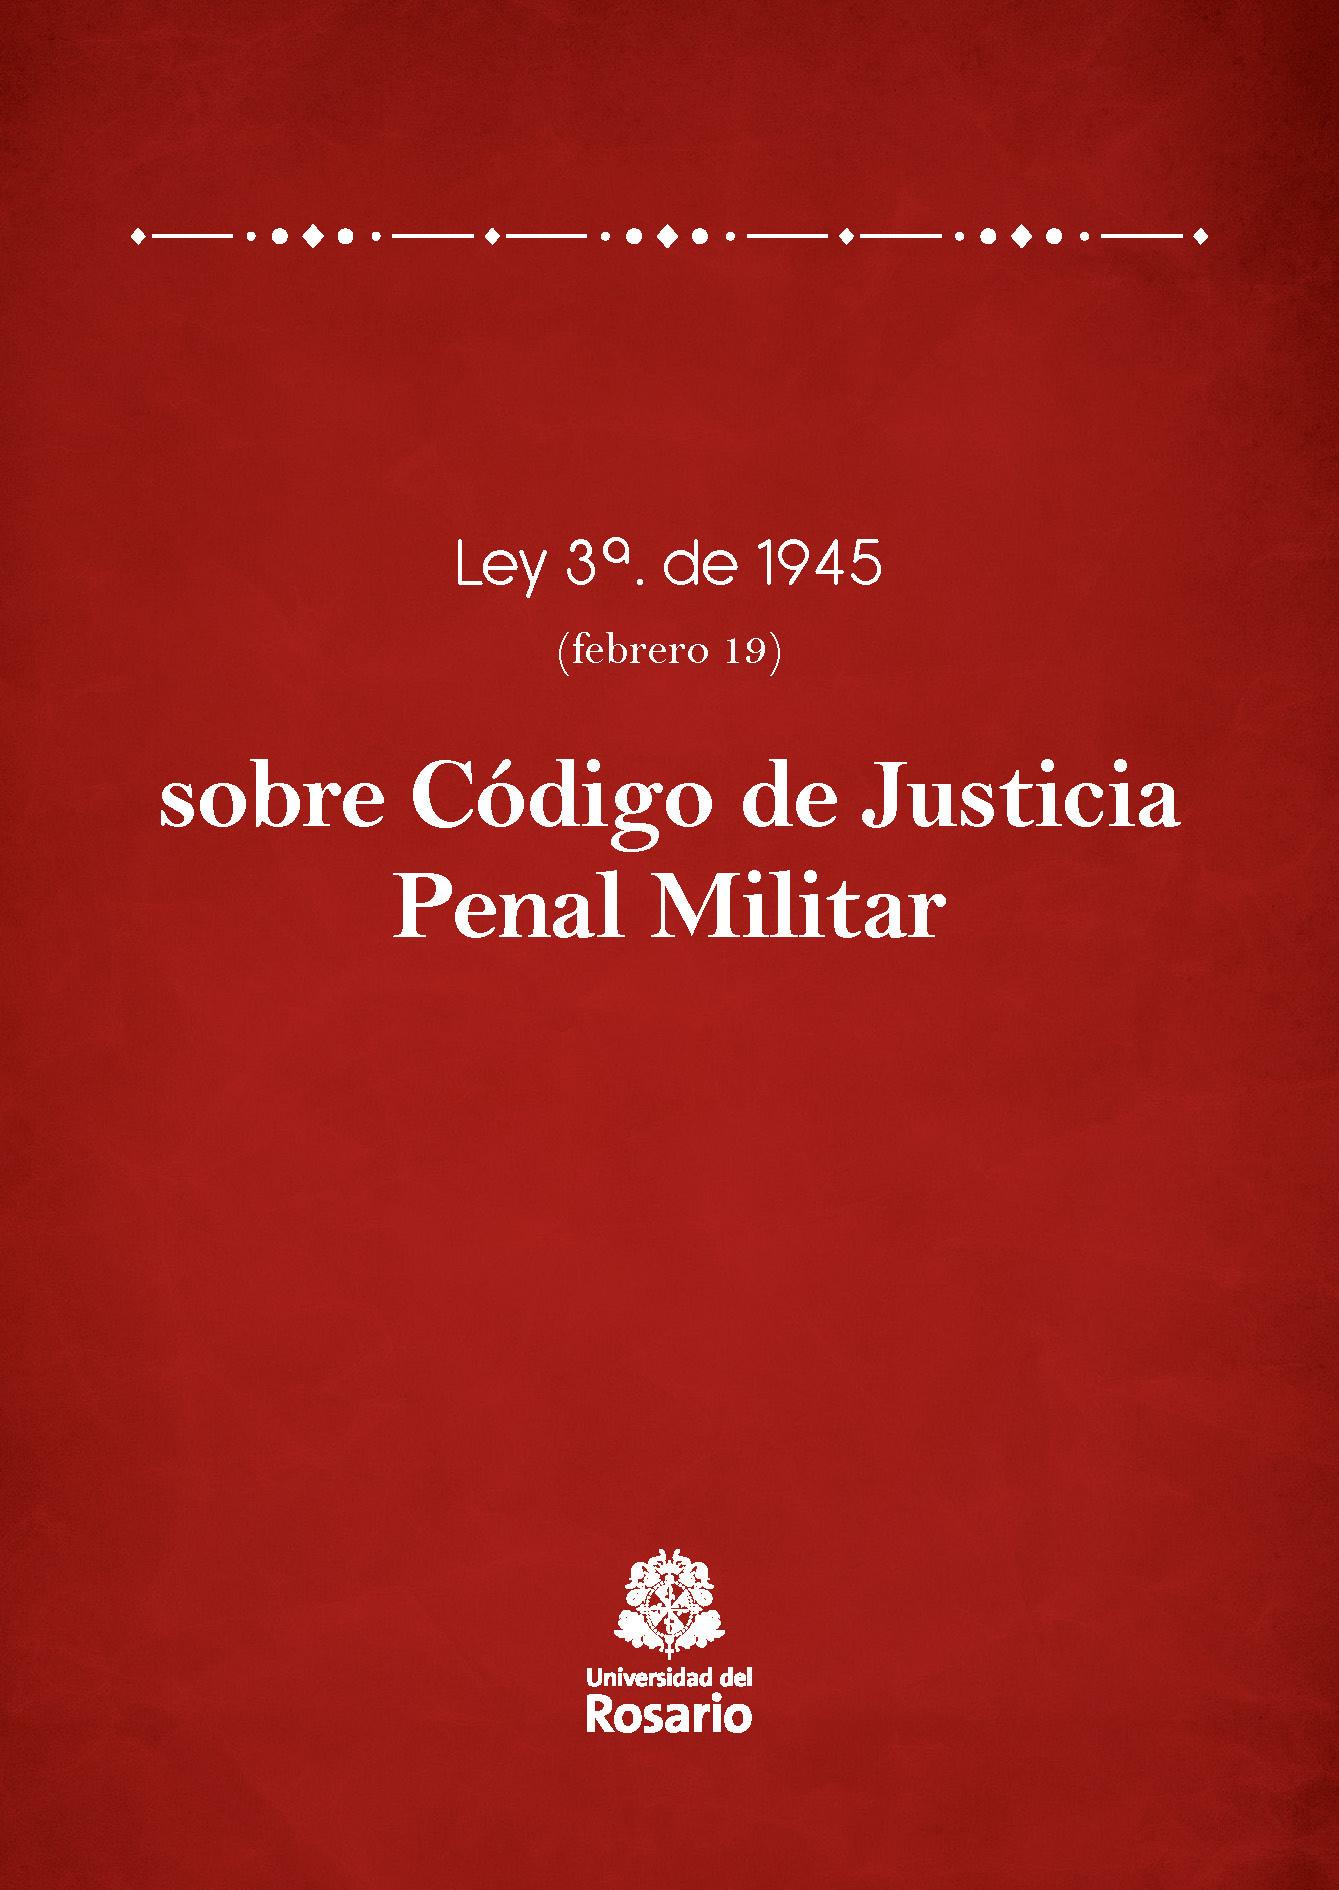 Ley 3a. de 1945 (febrero 19) sobre Código de Justicia Penal Militar